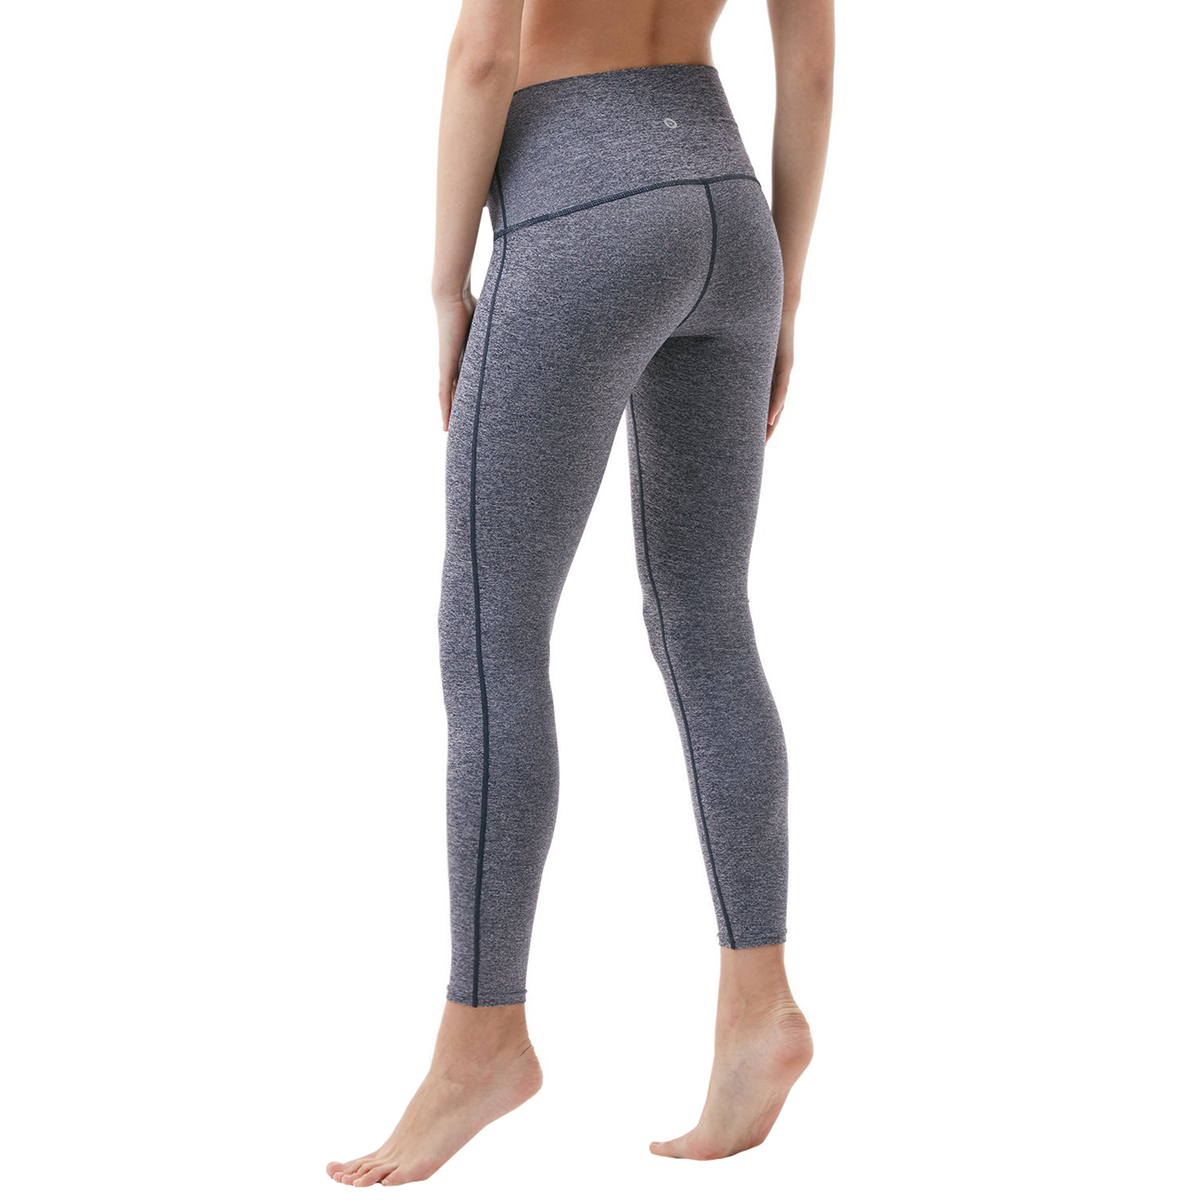 thumbnail 85 - TSLA Tesla FYP42 Women's High-Waisted Ultra-Stretch Tummy Control Yoga Pants